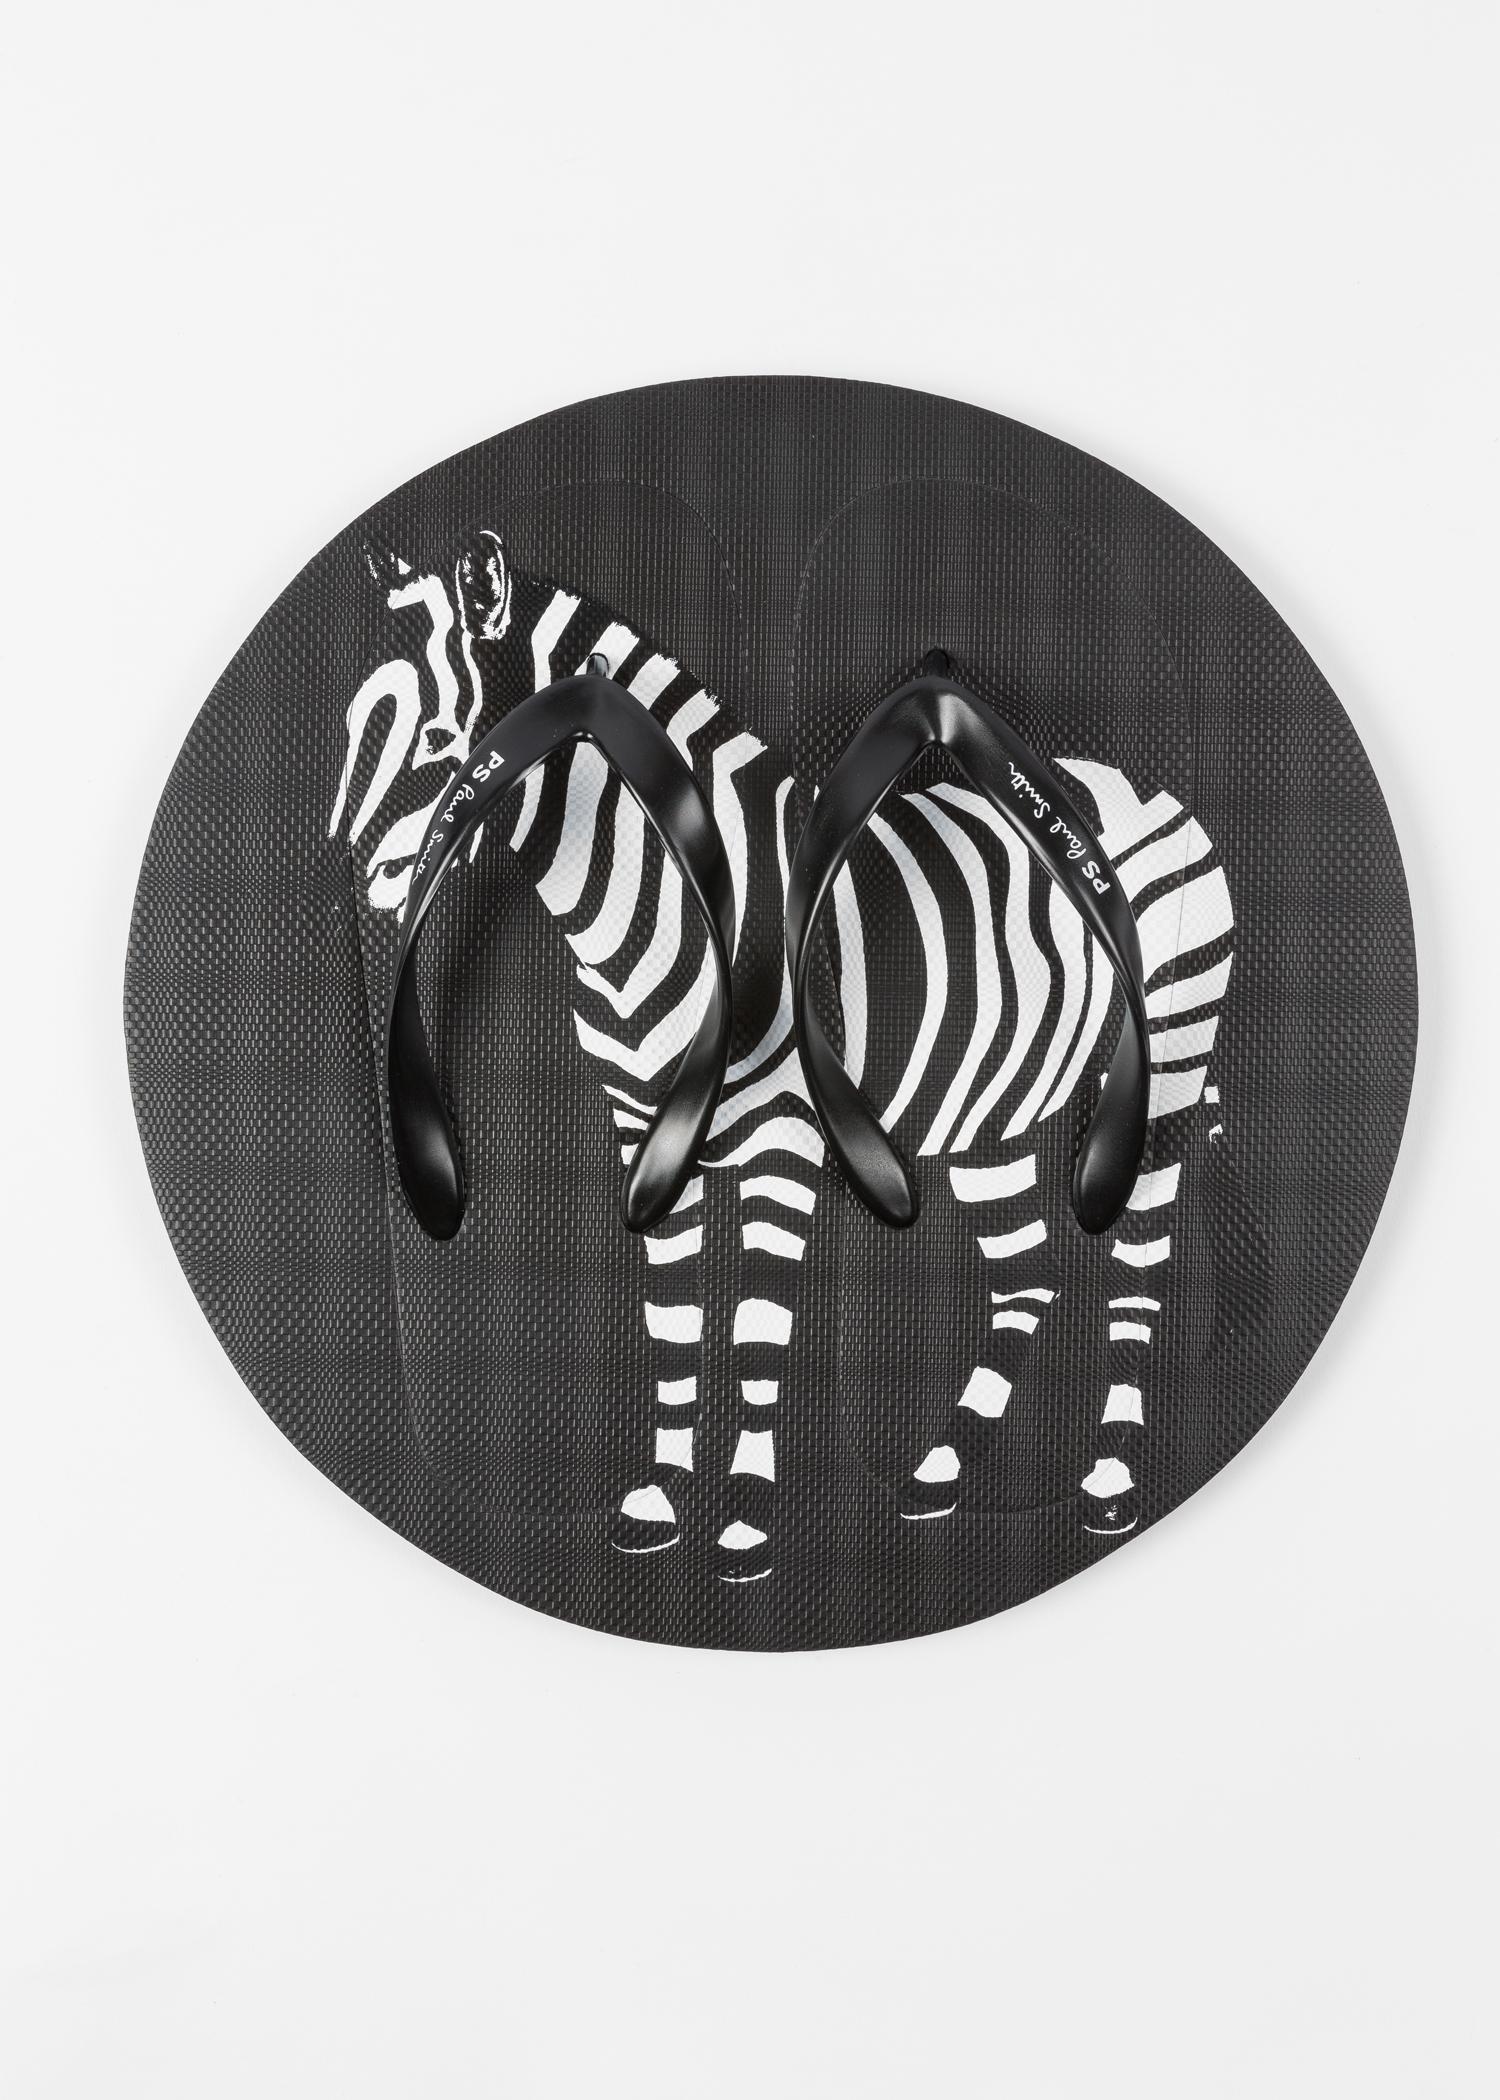 098a4786e201 ... Flops Paul Smith · Disc view - Men s Black  Zebra  Print  Disc  Flip ...